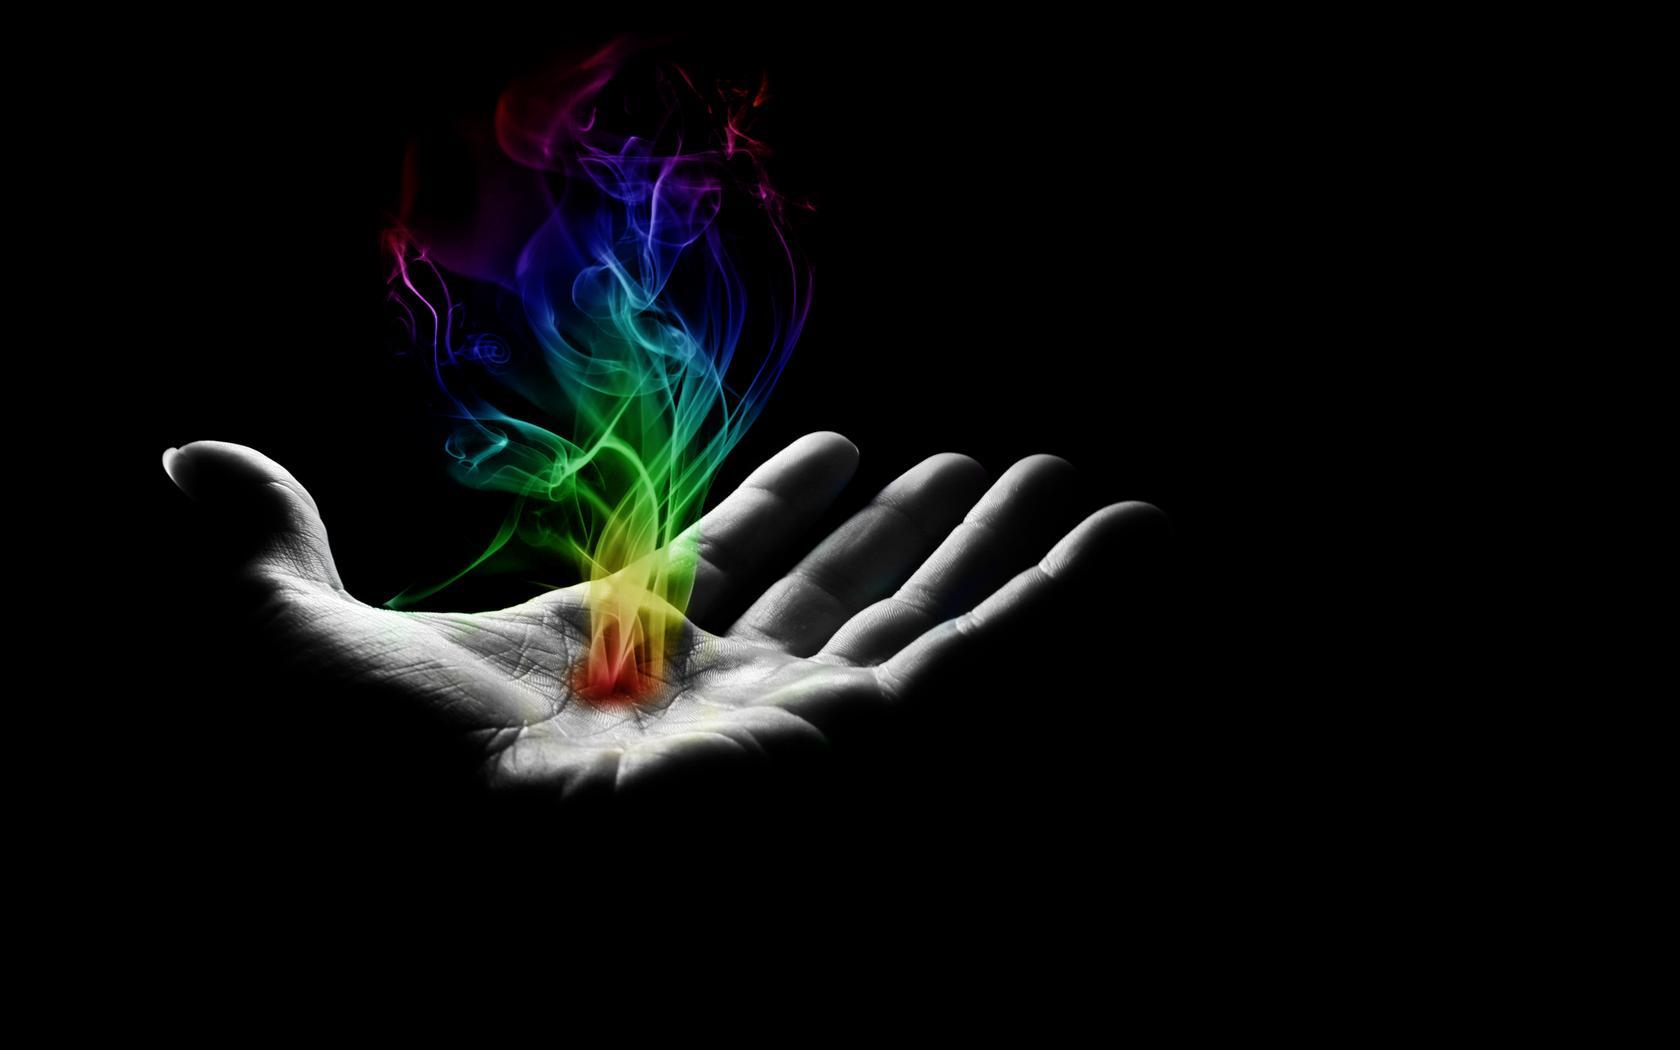 colorful 181 hand 101 smoke 107 background 465 1680x1050